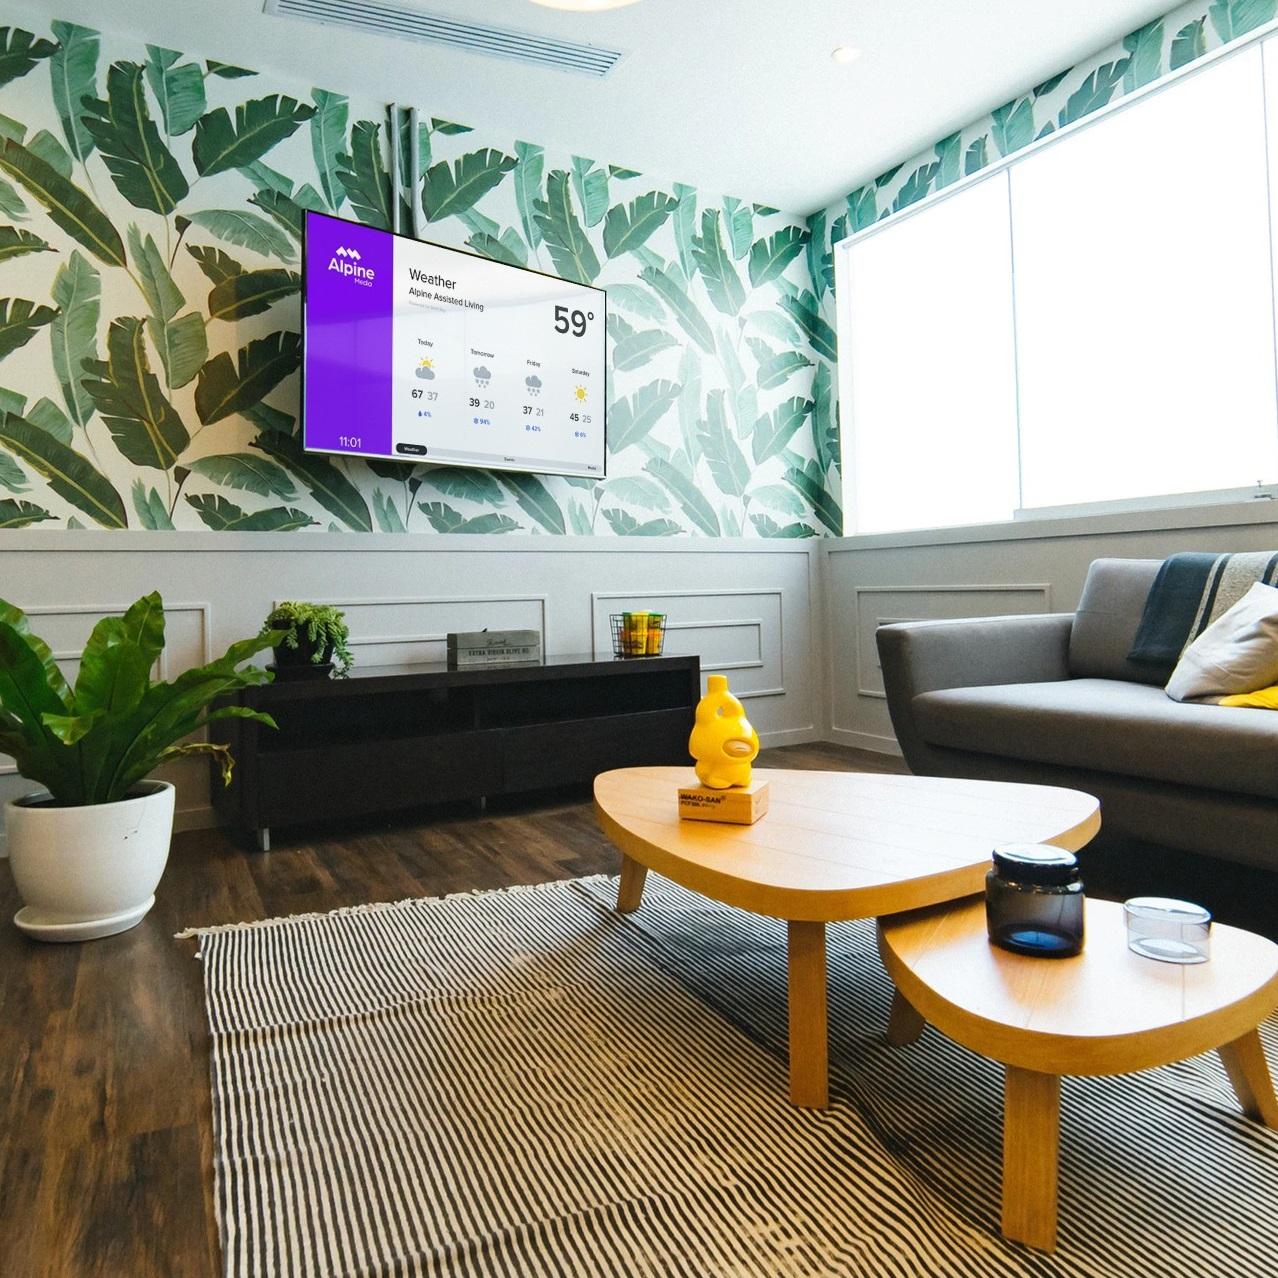 Alpine Media - Senior Living - Indoor Display